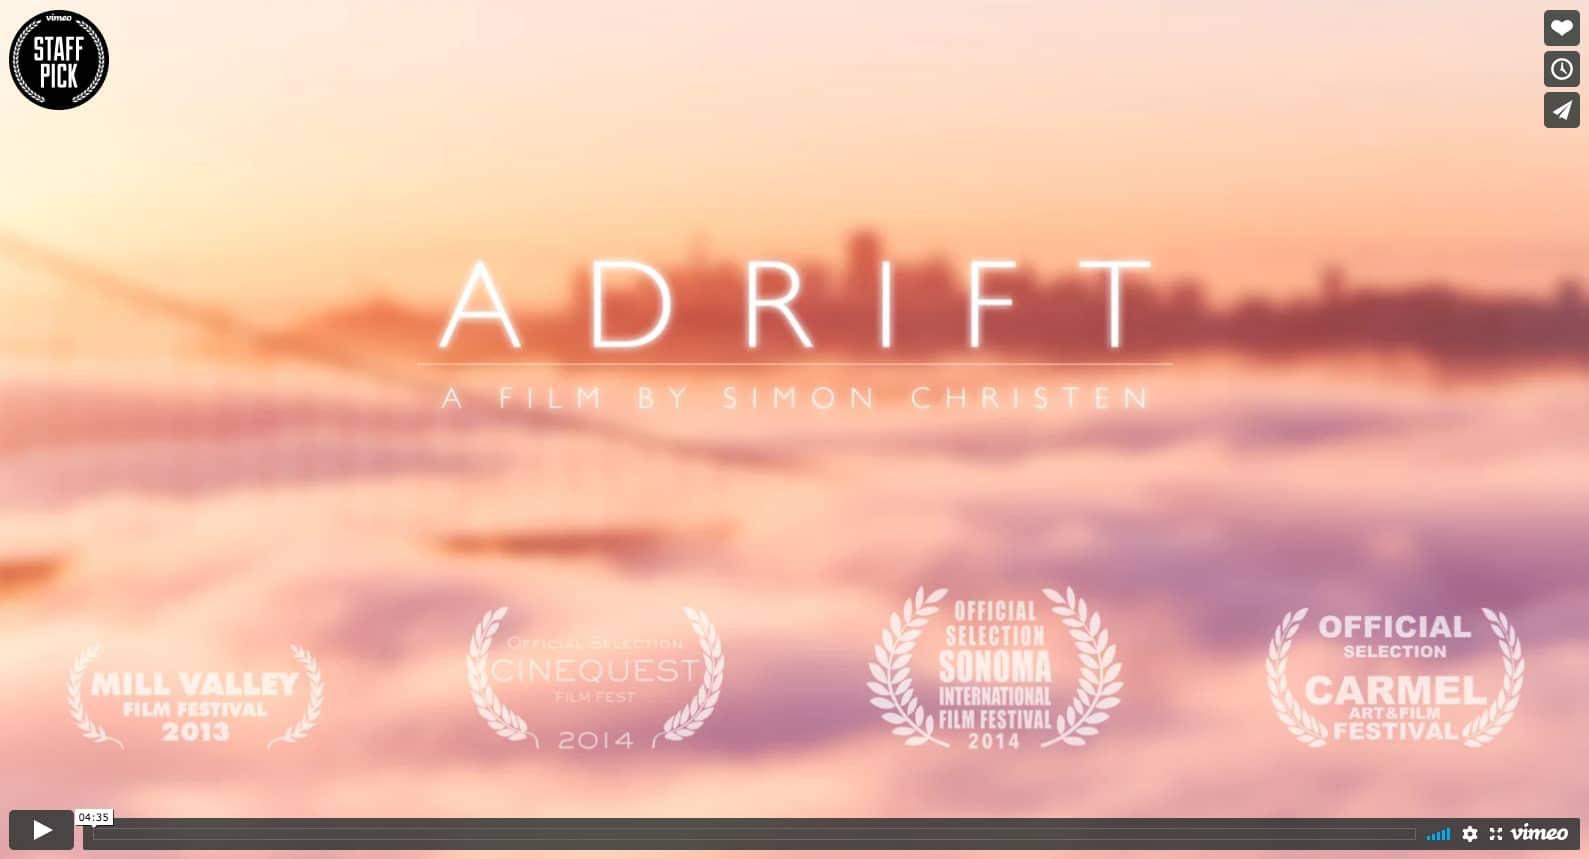 vimeo-screenshot-5 (1)